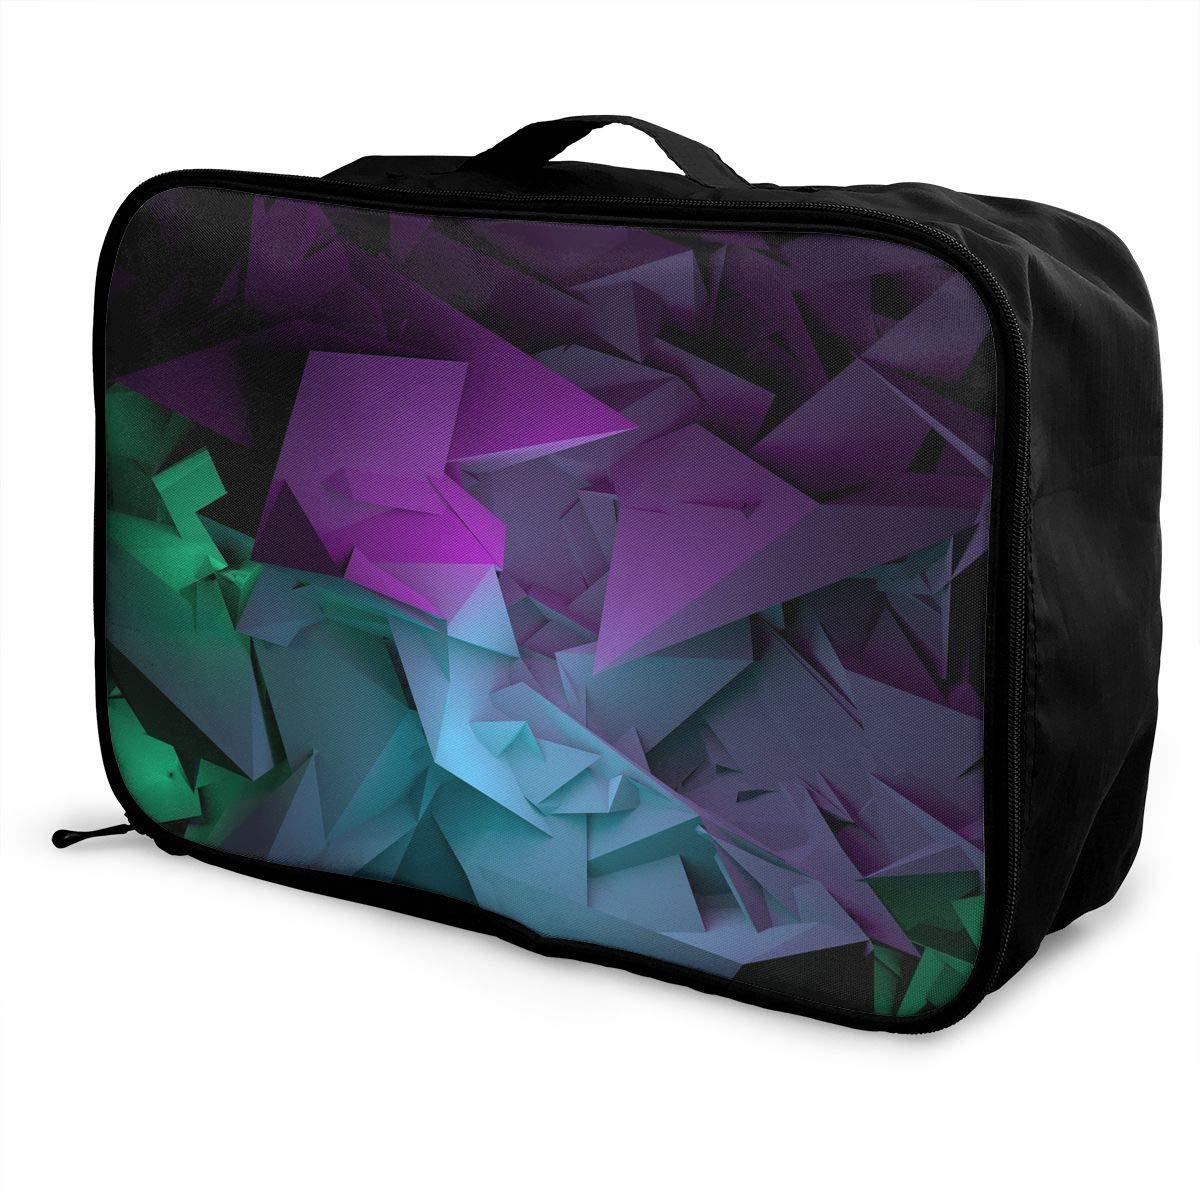 Travel Luggage Duffle Bag Lightweight Portable Handbag Origami Cranes Pattern Large Capacity Waterproof Foldable Storage Tote